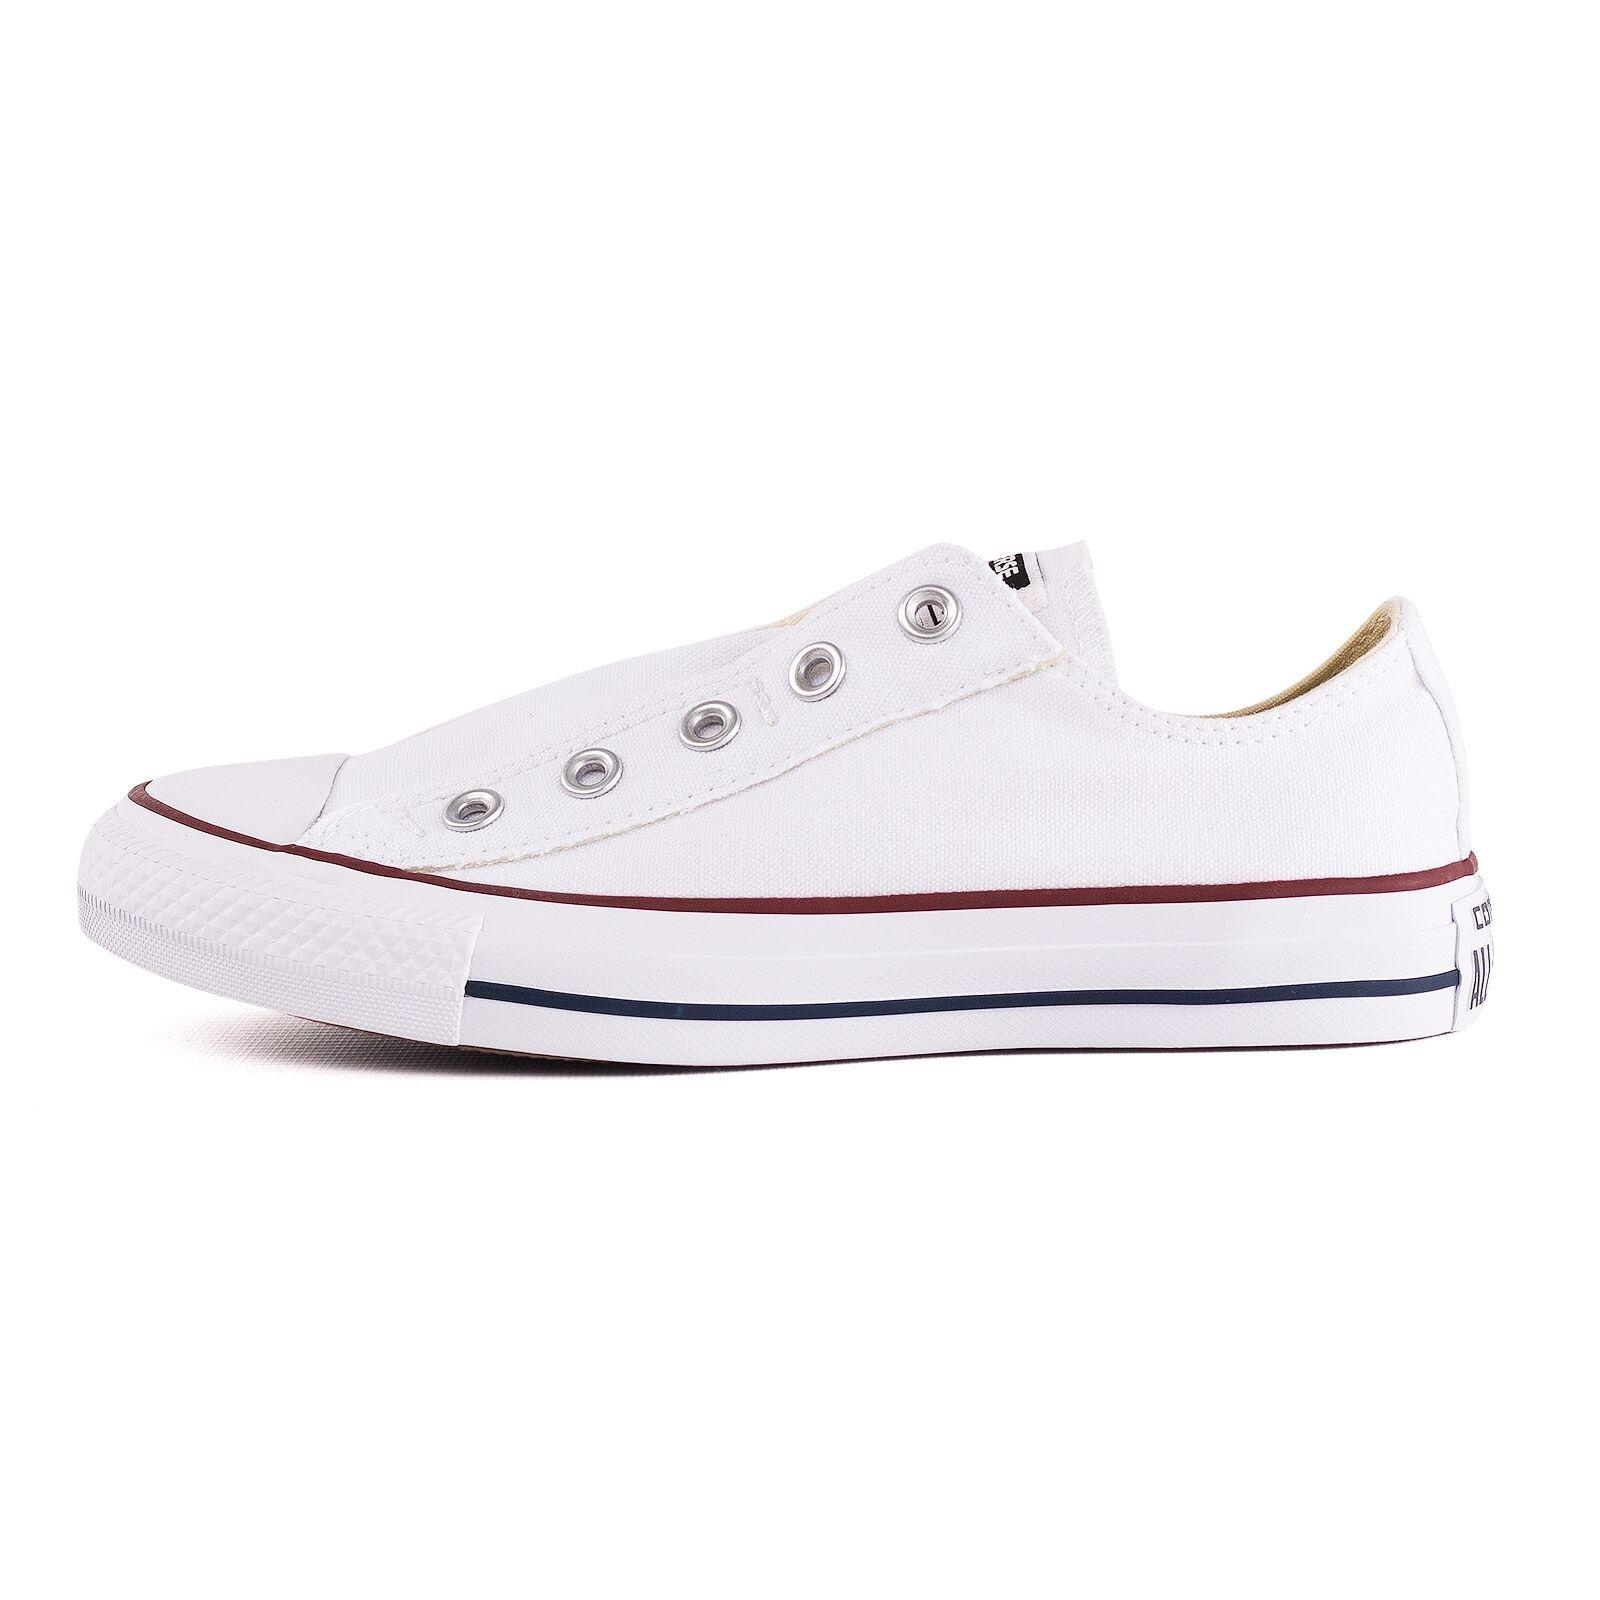 Converse CT AS Slip 51232 Schuhe Unisex Sneaker, Weiß, 51232 Slip 400104